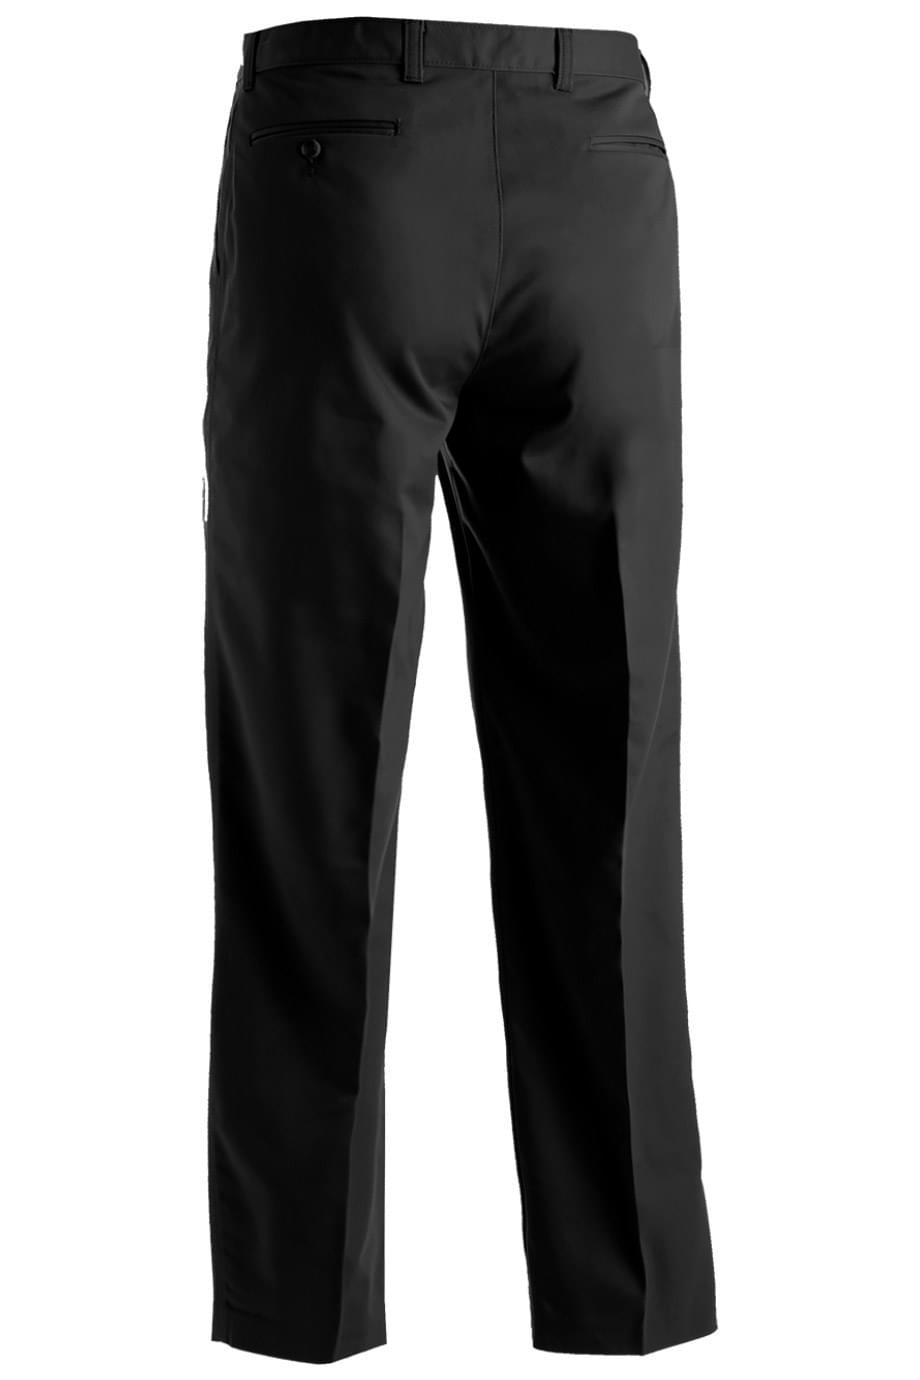 MICROFIBER FLAT FRONT DRESS PANT